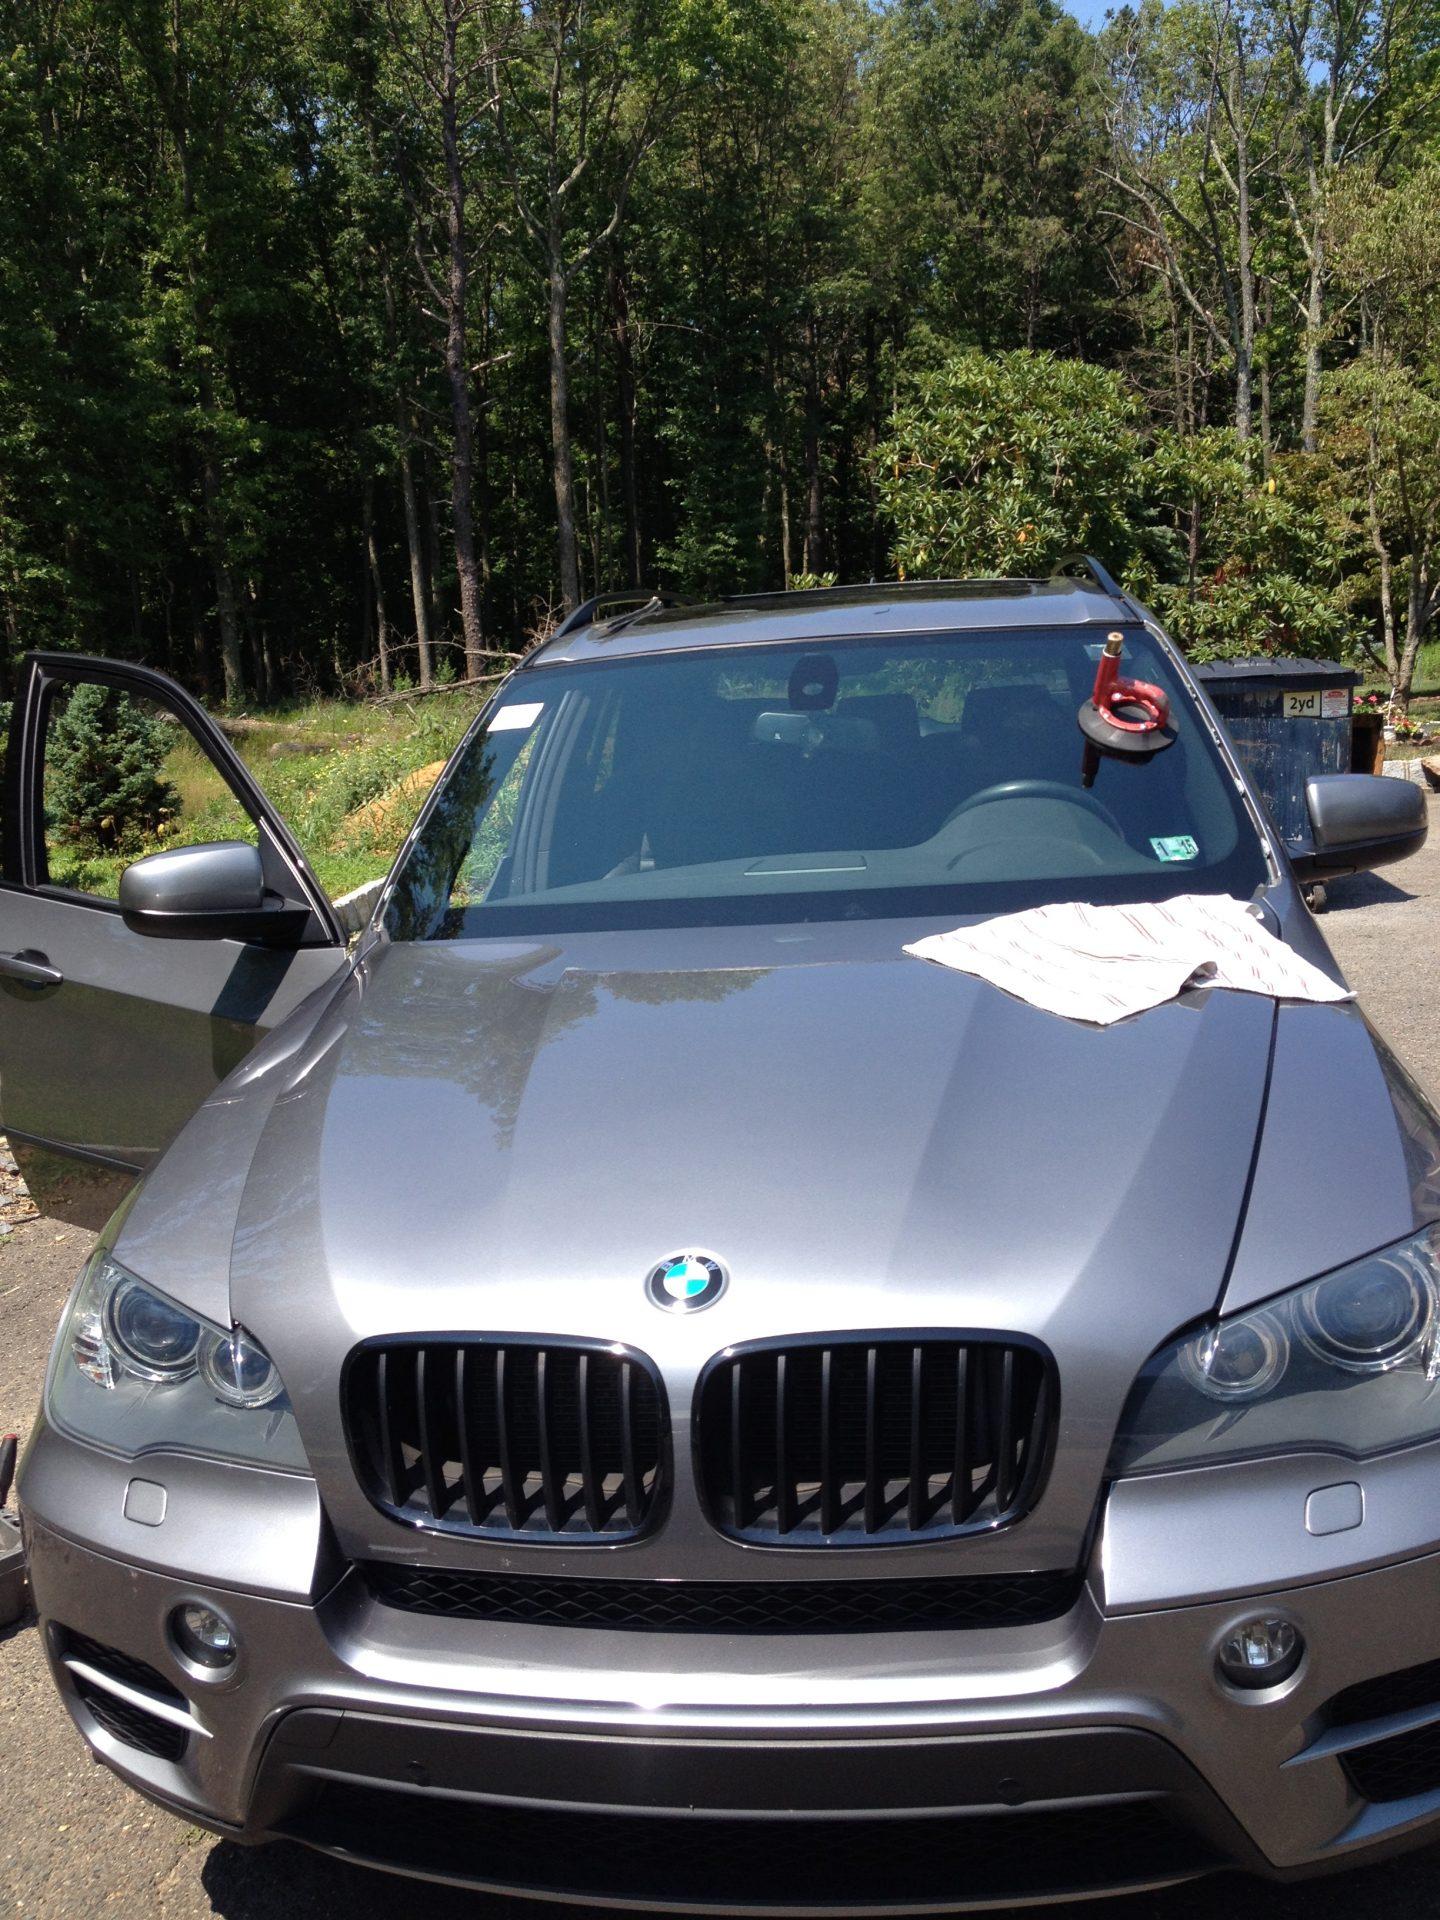 2012 BMW X5 install done Windshield Replacement by Morris County Platinum Auto Glass NJ@platinumautoglassnj